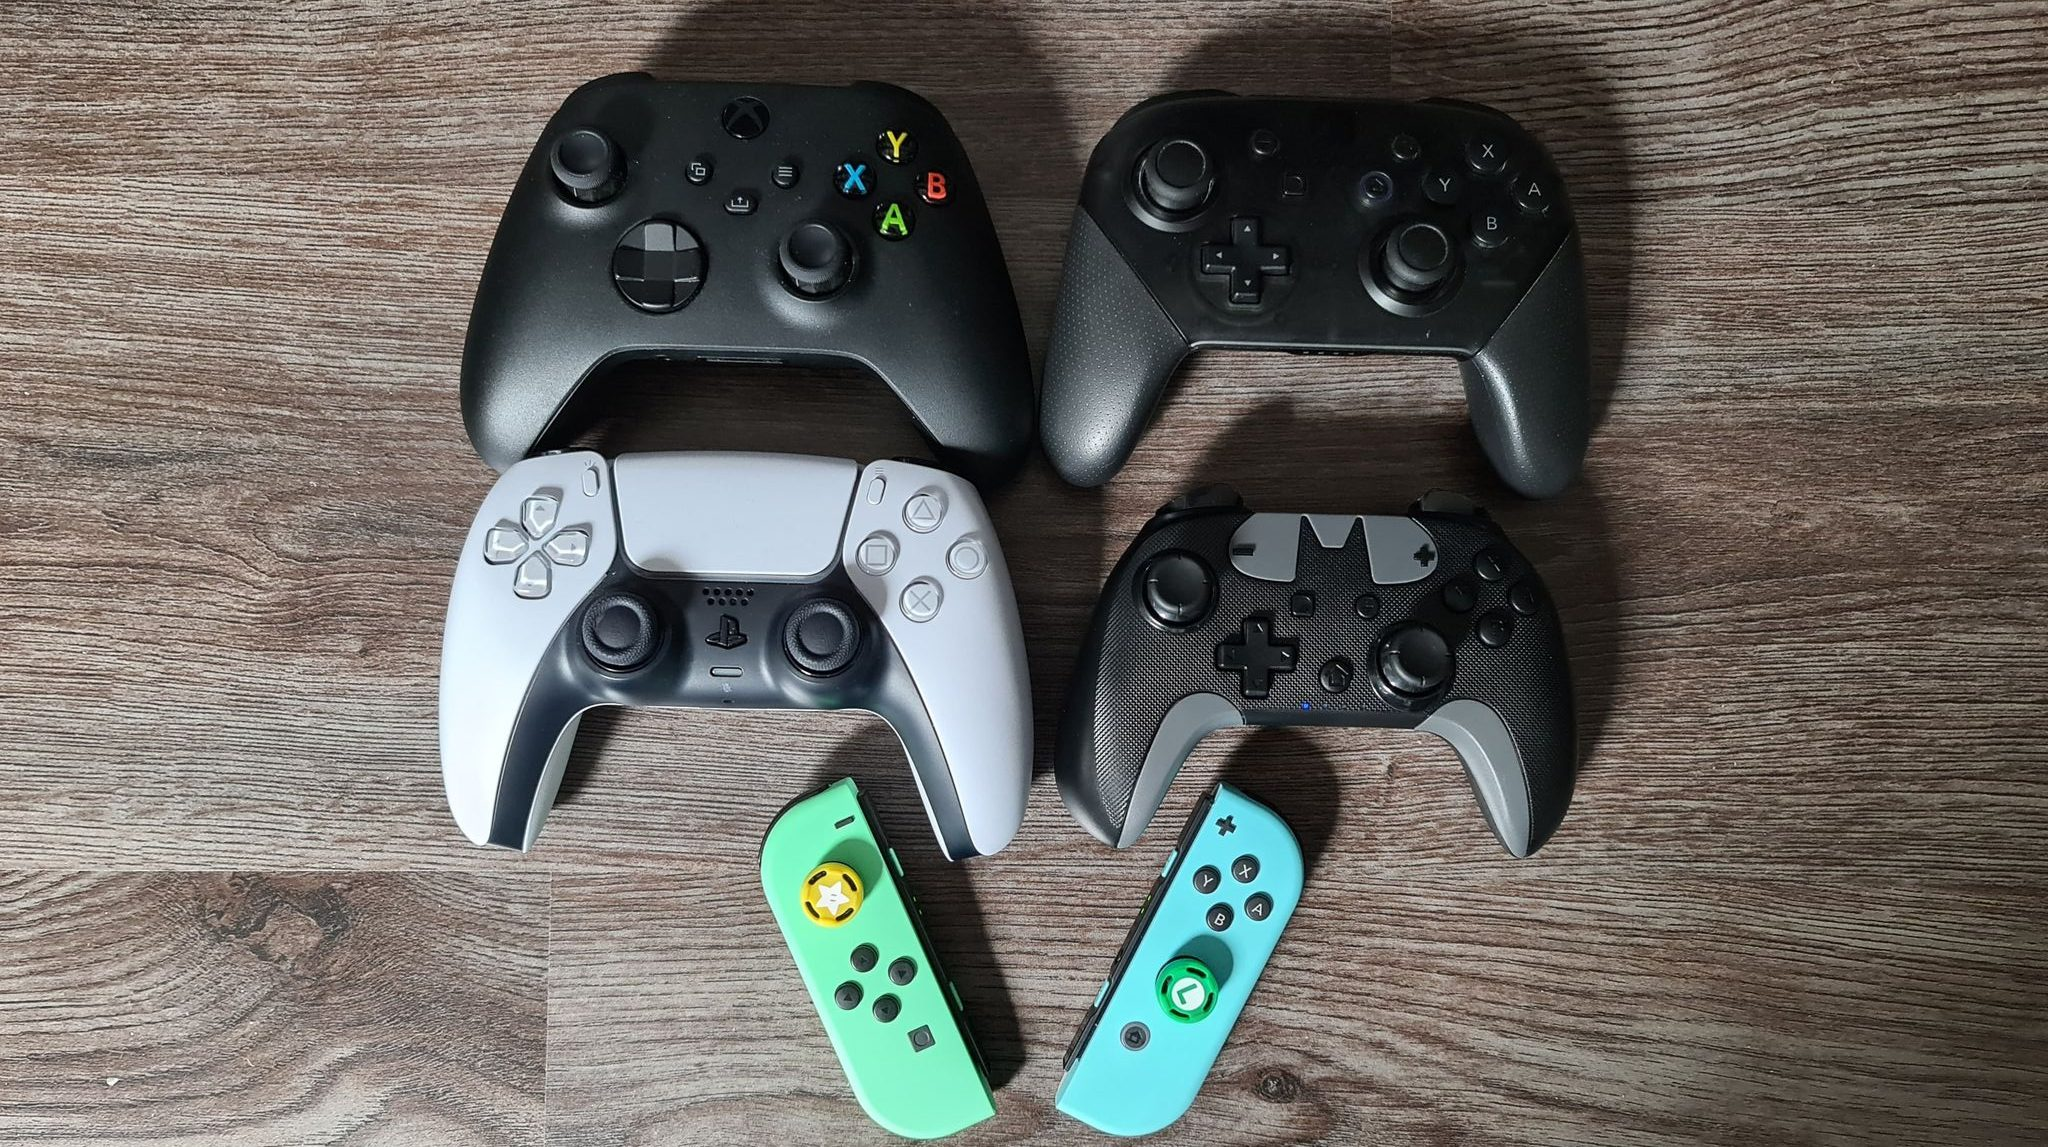 minibird vs controllers